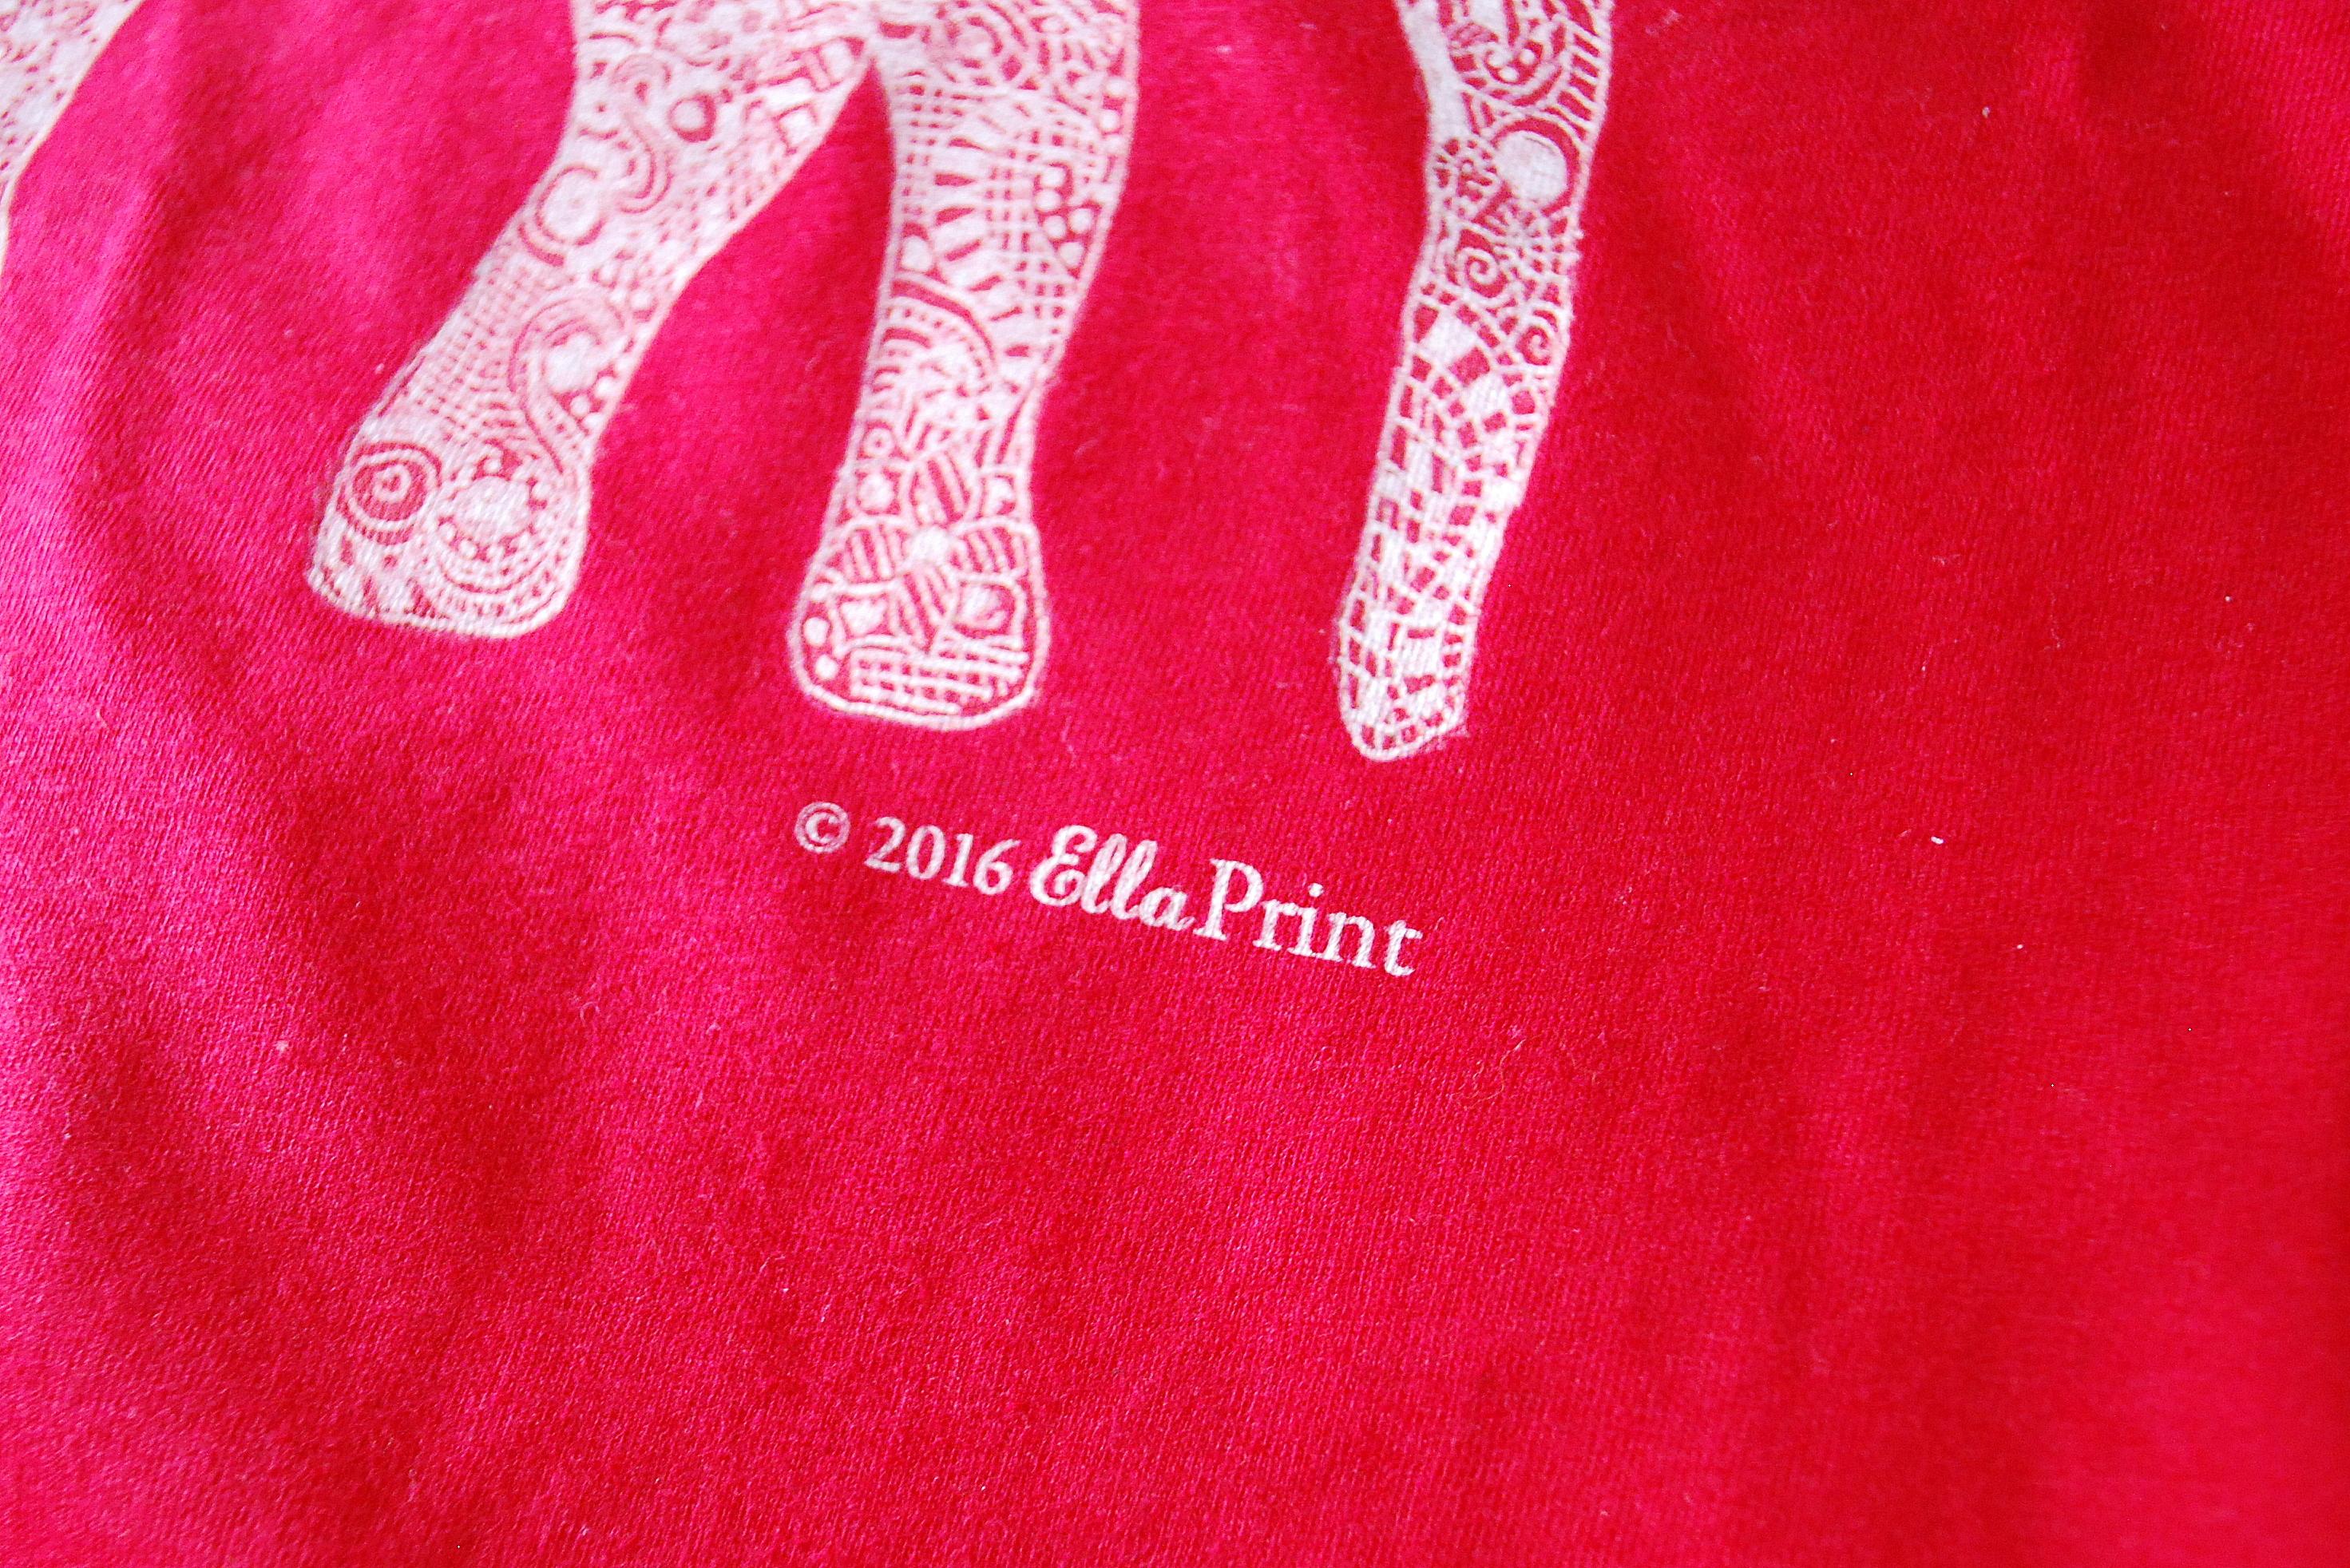 Elephant Shirt 2